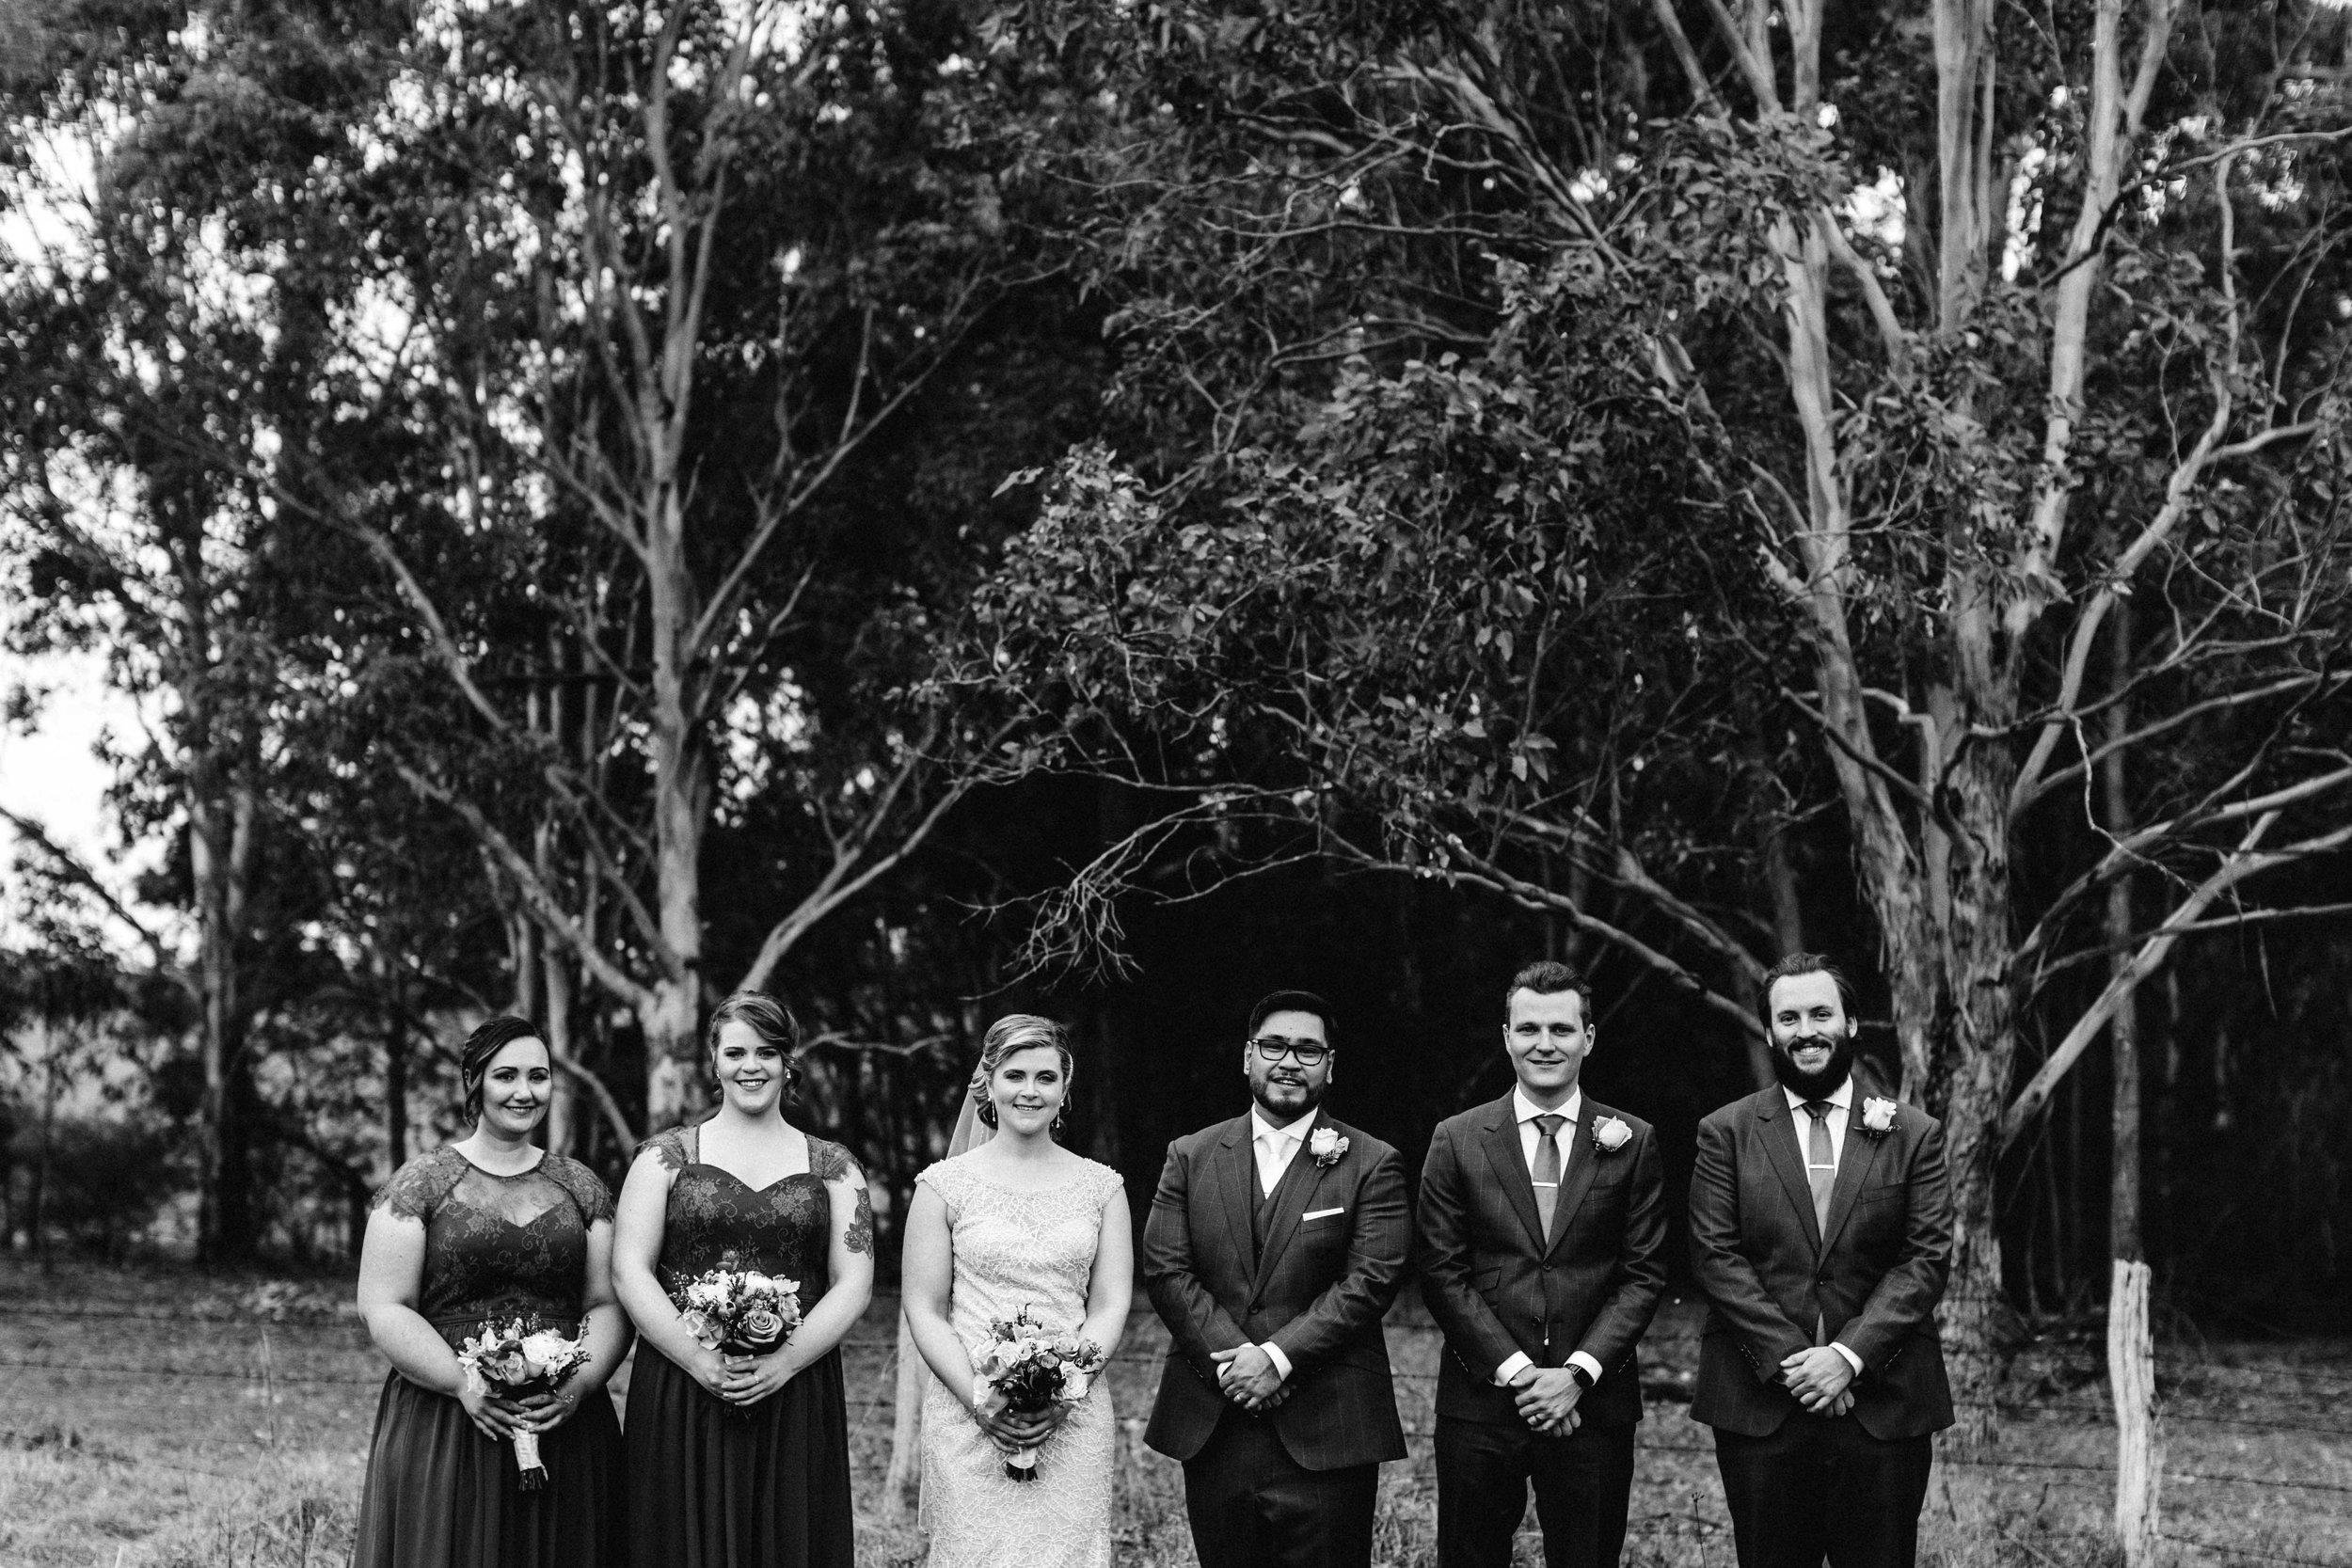 appin-house-wedding-macarthur-www.emilyobrienphotography.net-107.jpg